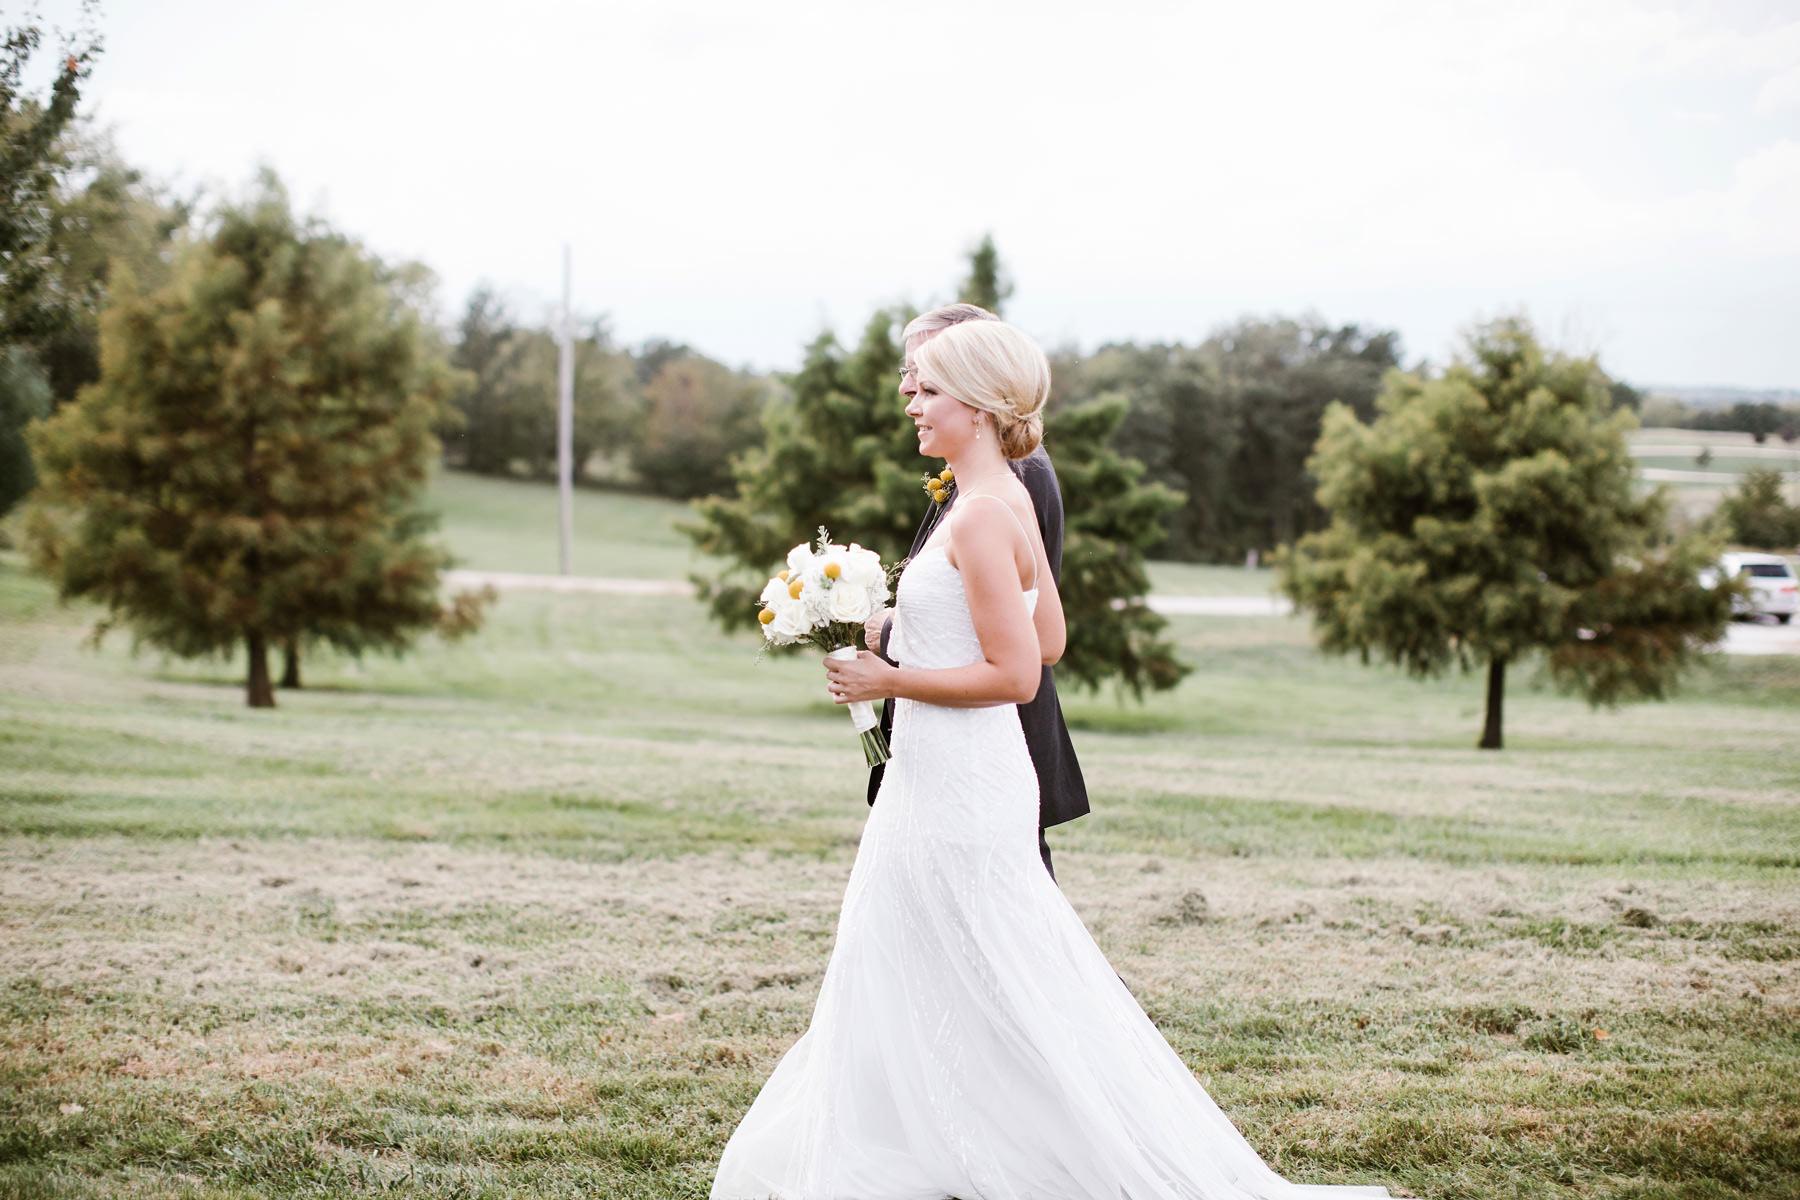 Alldredge Orchard Kansas City_Kindling Wedding Photography BLOG 39.JPG